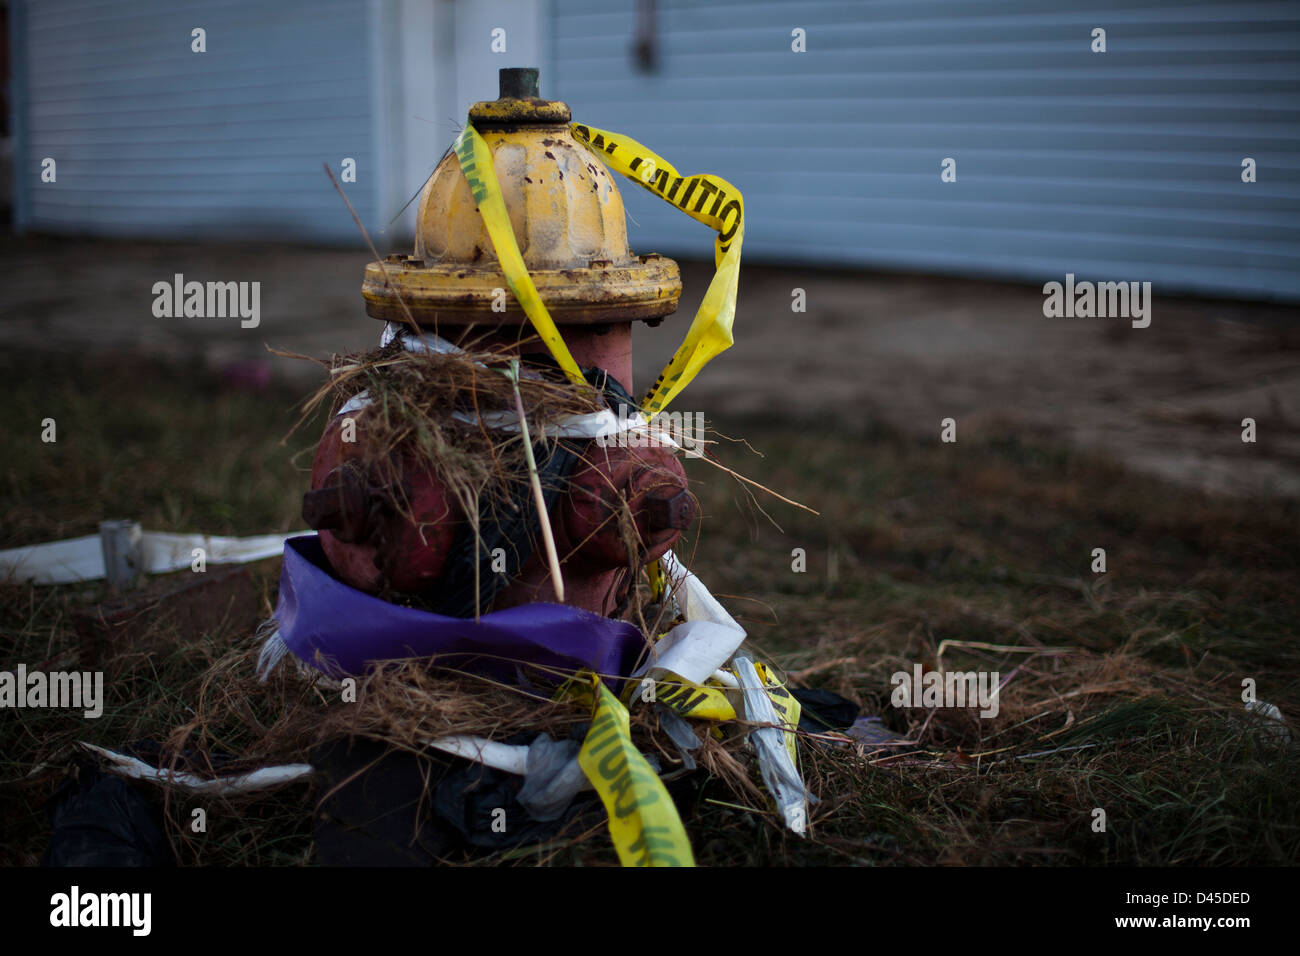 Wreckage around Keansburg Amusement Park, NJ due to Superstorm Sandy - Stock Image